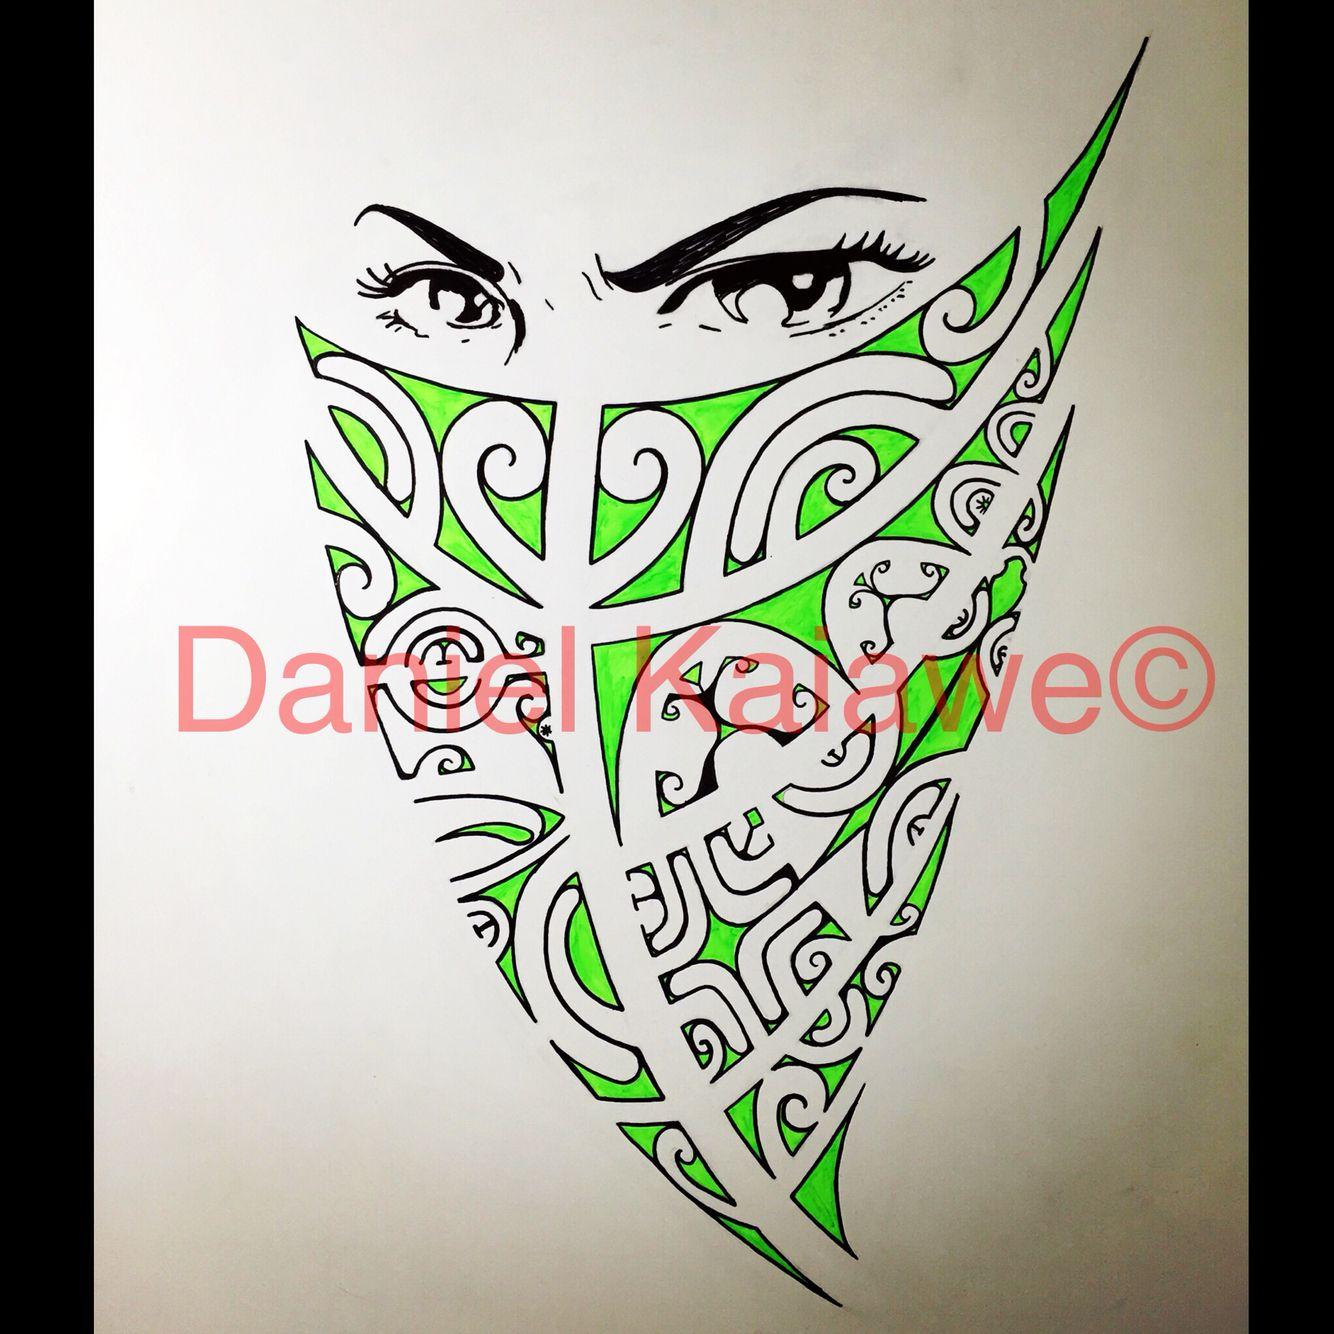 1334x1334 Green Polynesian Tattoo Drawing 2 Tattoo Drawings